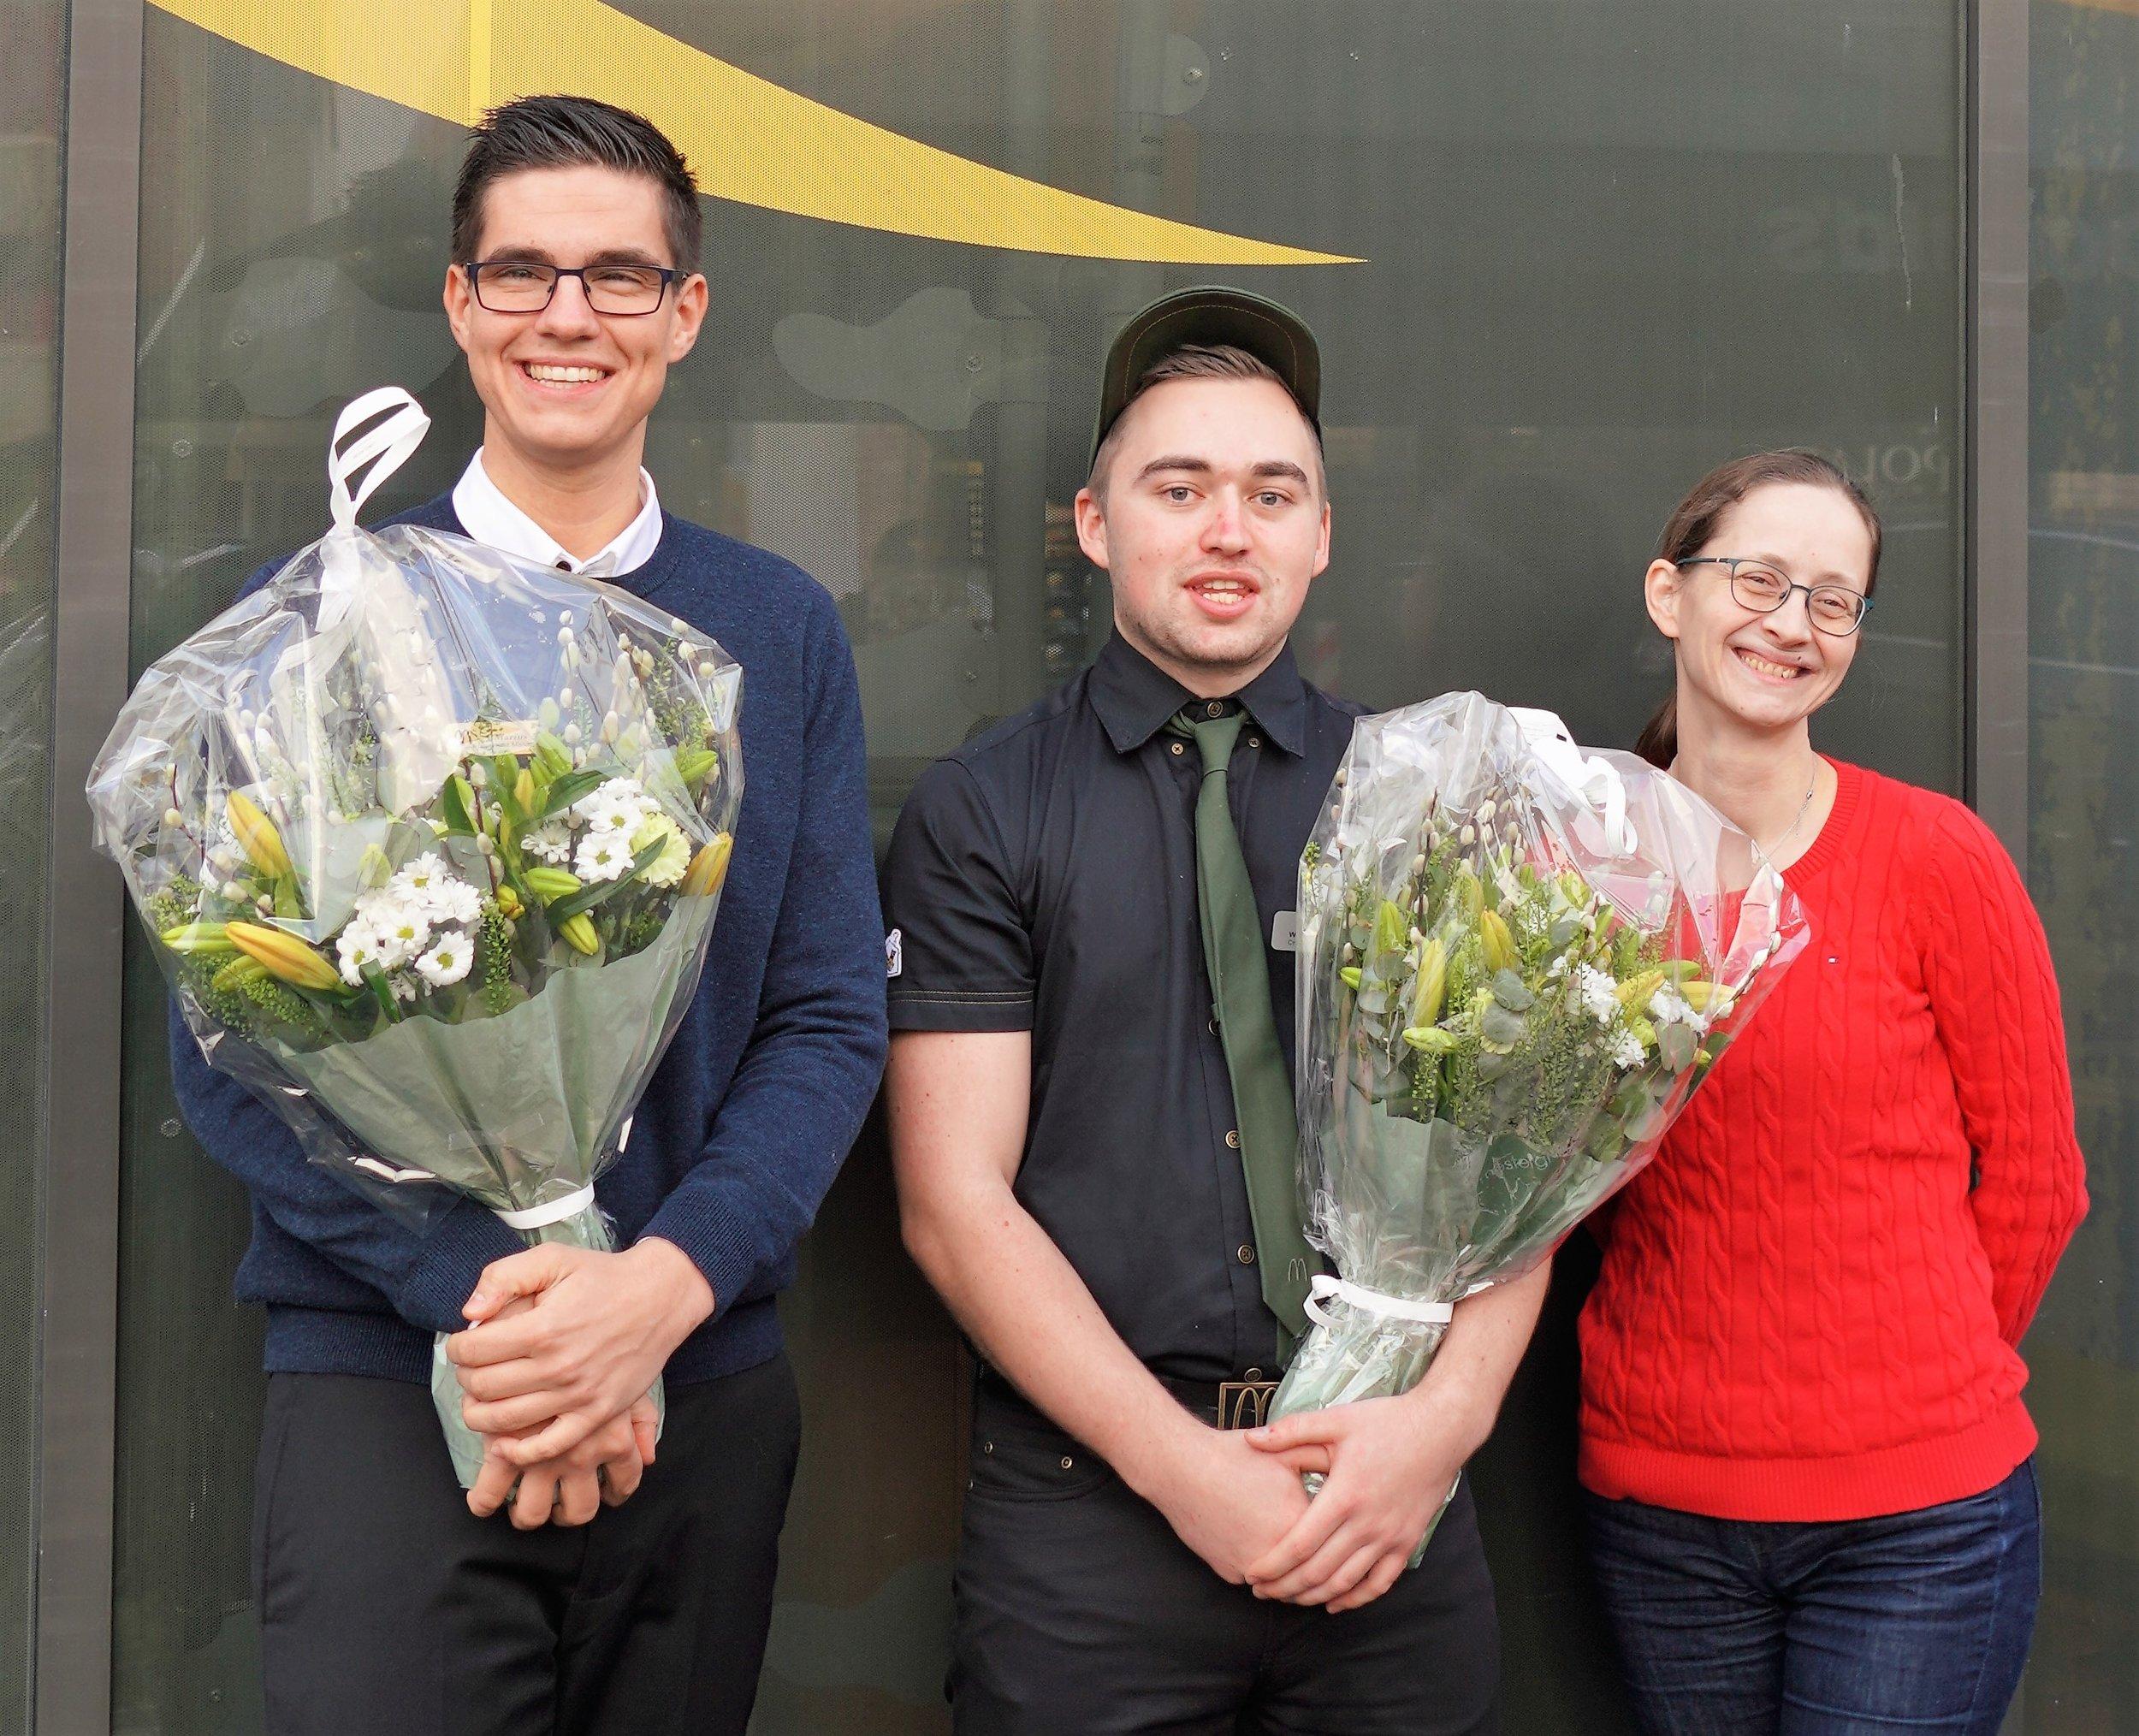 Fra venstre: Marius Kyte Alfheim (daglig leder), William (nyansatt hos McDonald's) og Idun Bortne (fylkesleder for Venstre). Foto: Jarle Eknes